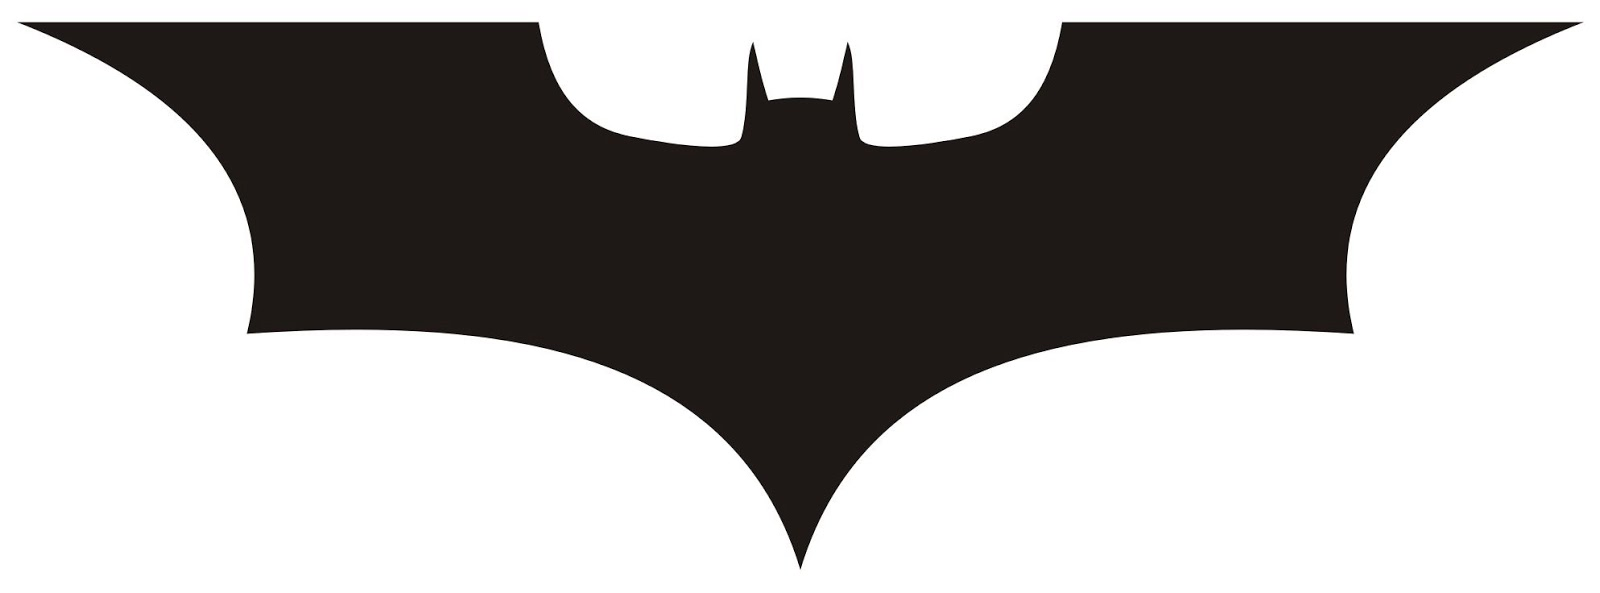 1600x593 30 Images Of Template Batman Dark Knight Logo